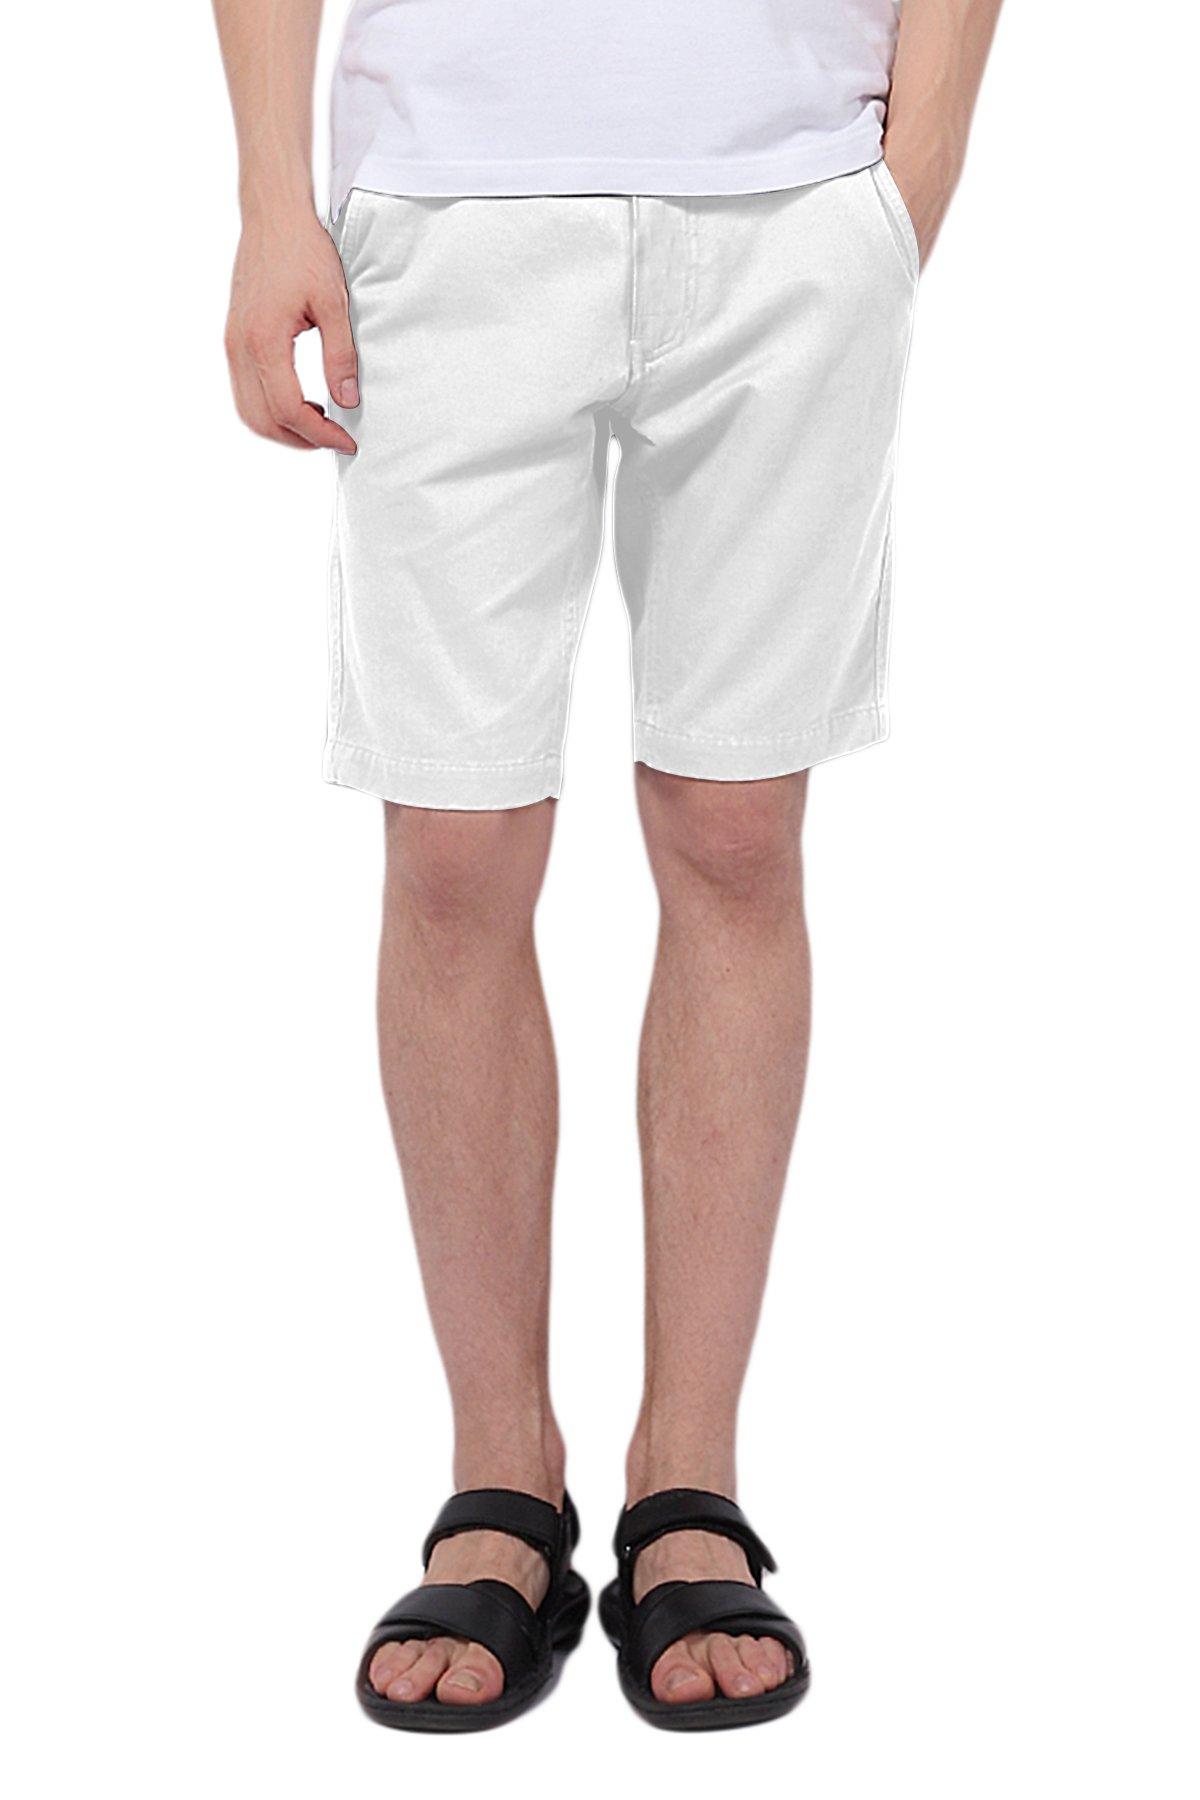 Pau1Hami1ton PH-01 Men's Chino Casual Shorts Slim Fit(34 White)